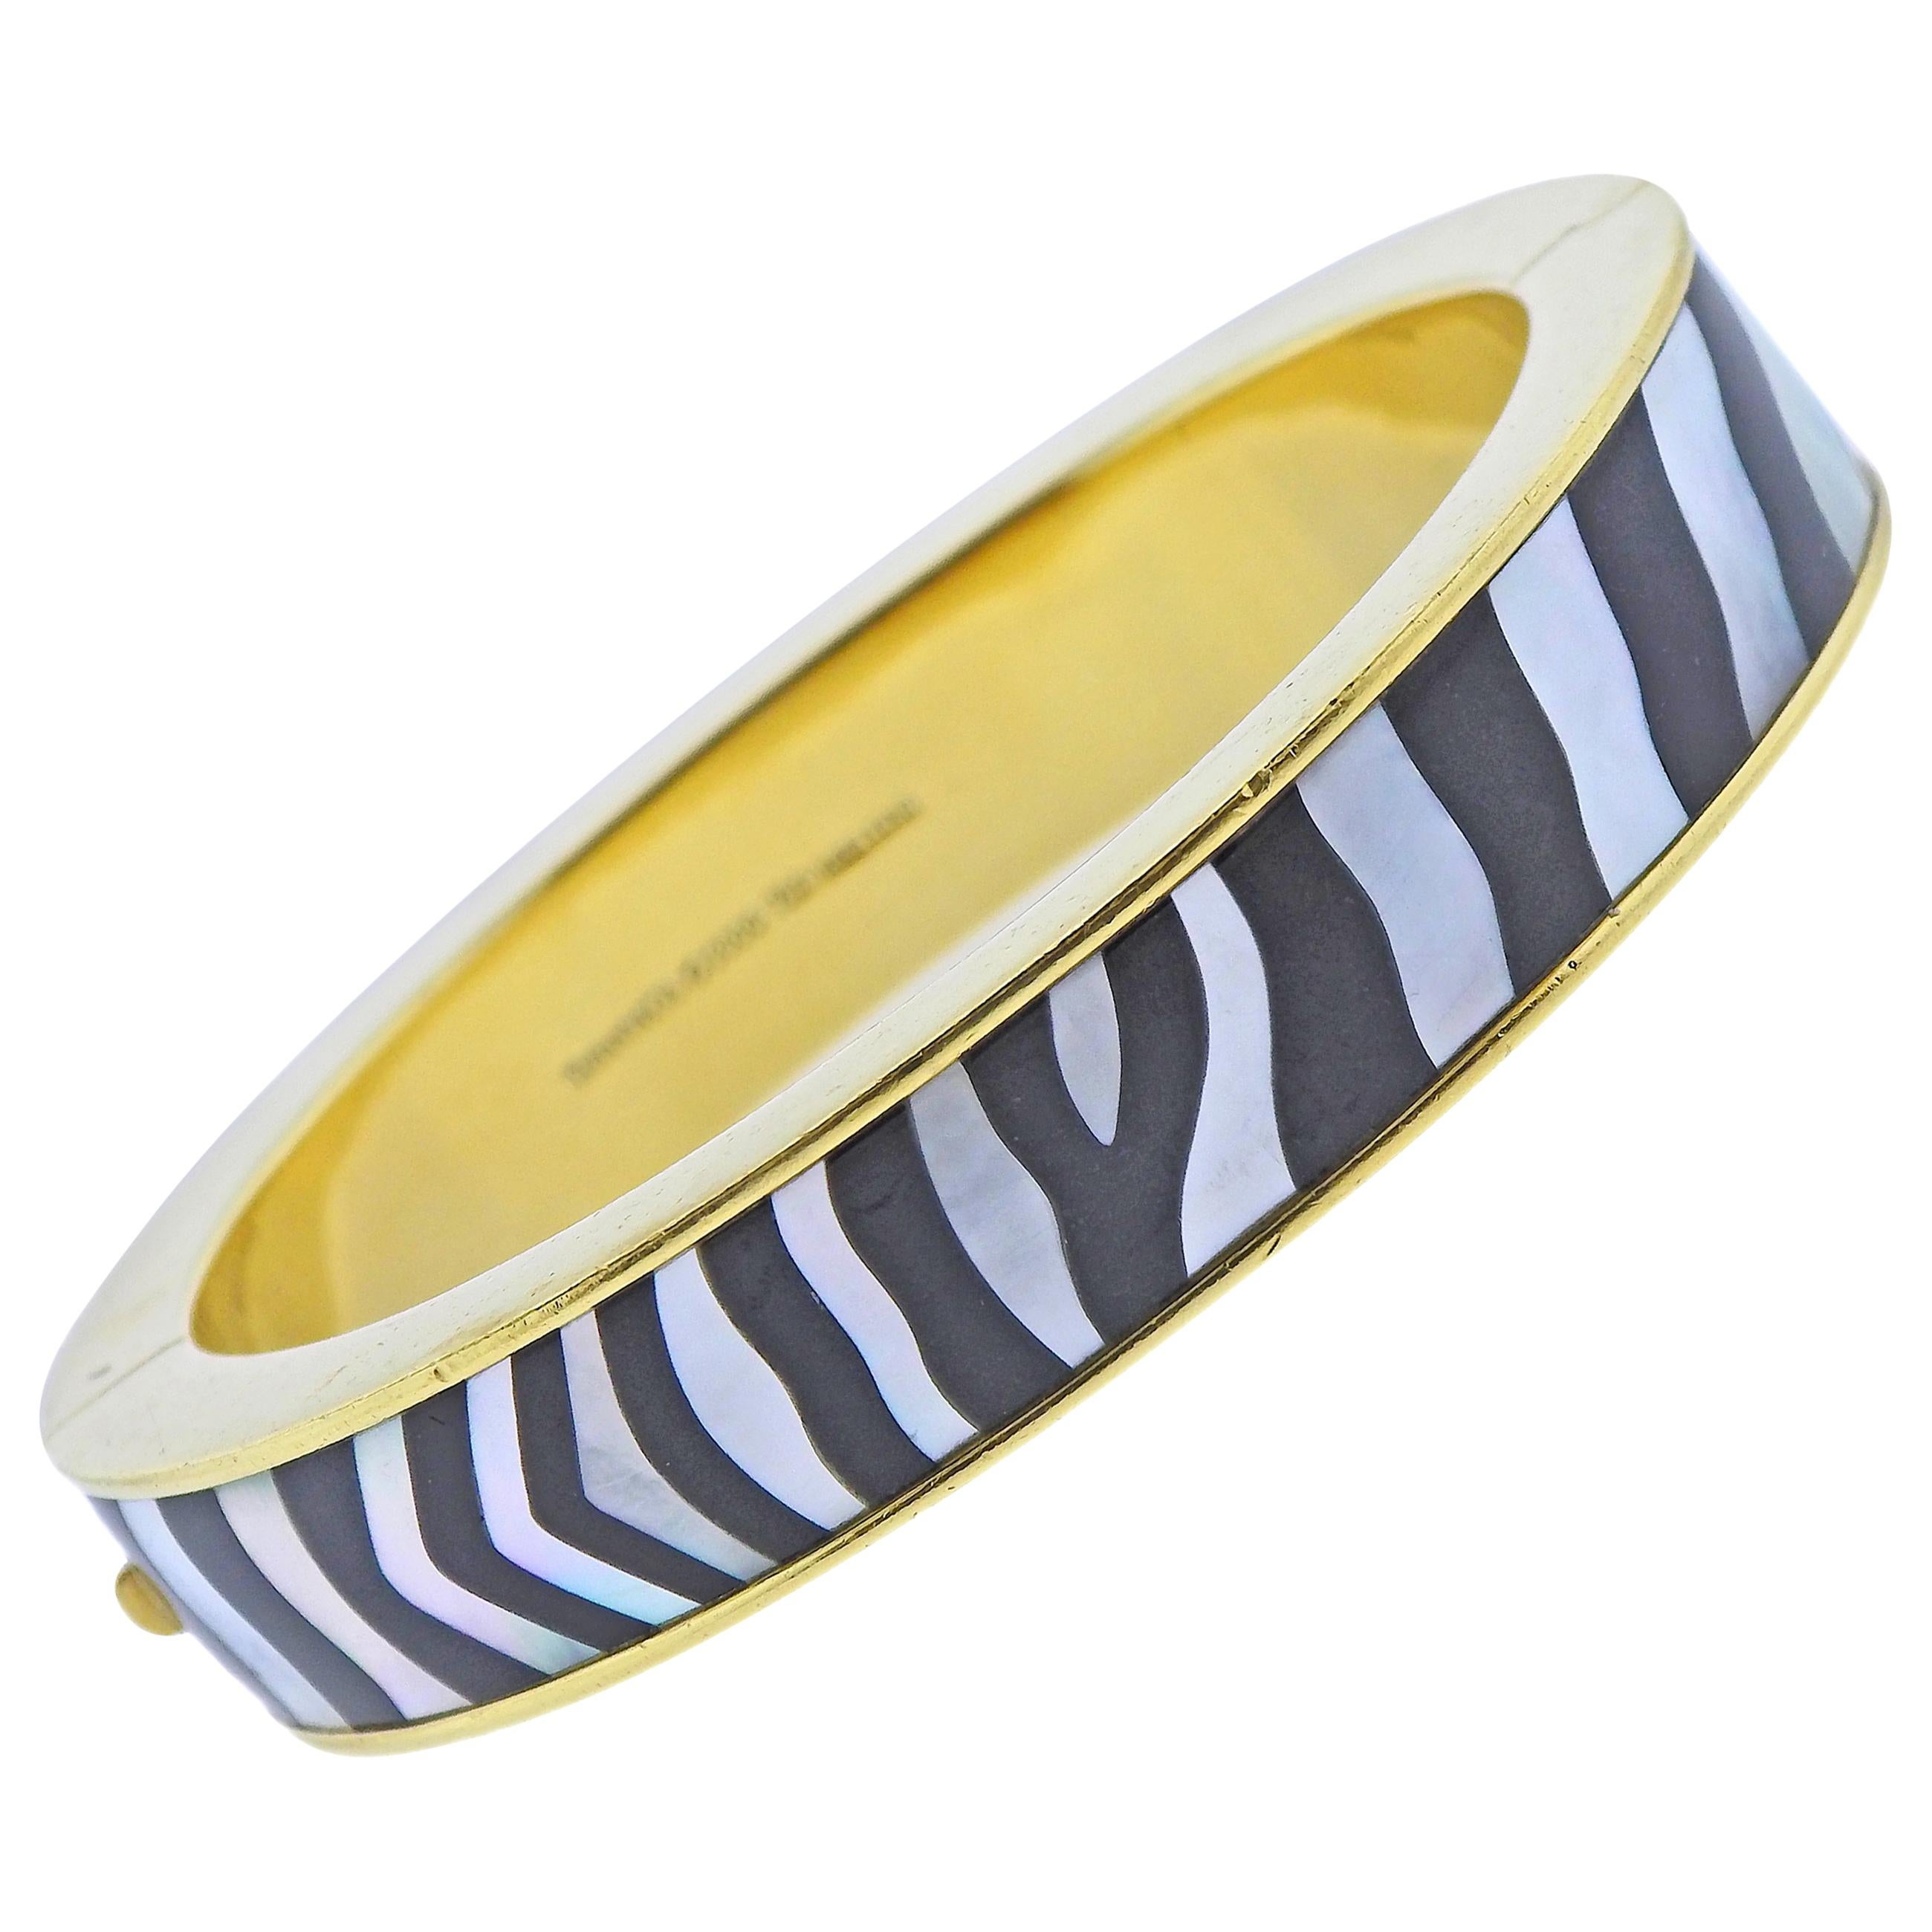 Tiffany & Co. Mother of Pearl Black Jade Inlay Zebra Gold Bracelet